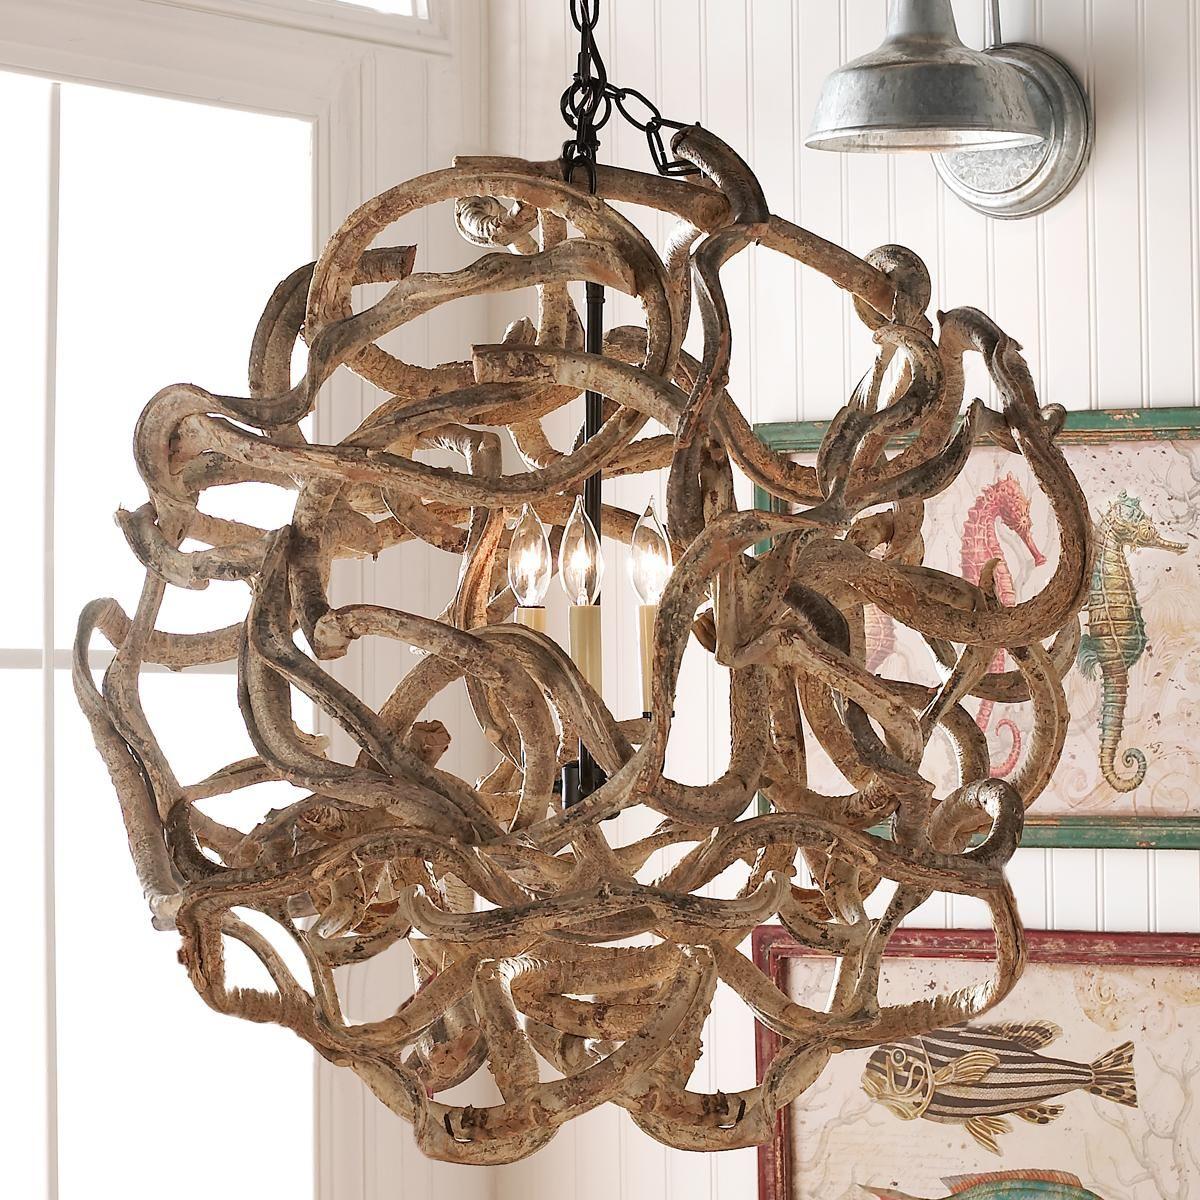 De Vine Wood Ball Chandelier An Imaginative Surprise In